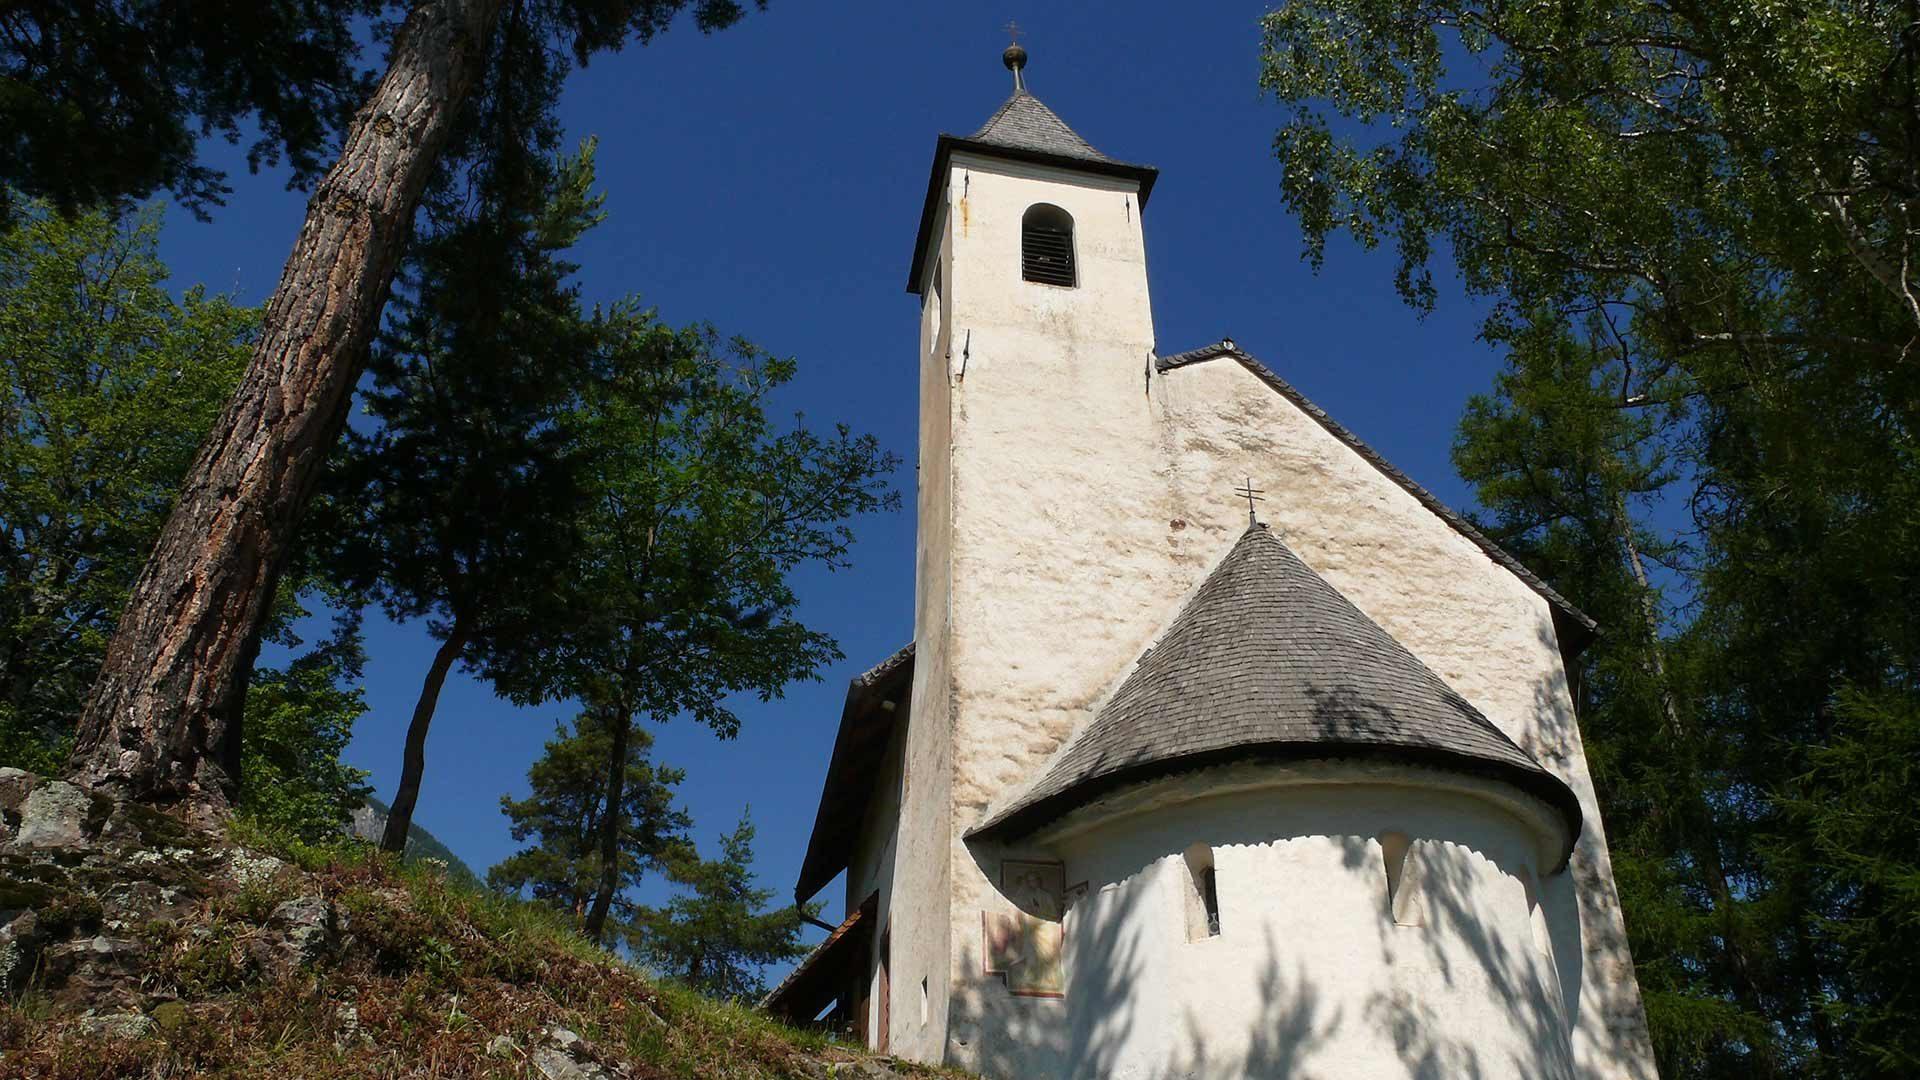 Grissian - St. Jakob Kirchlein